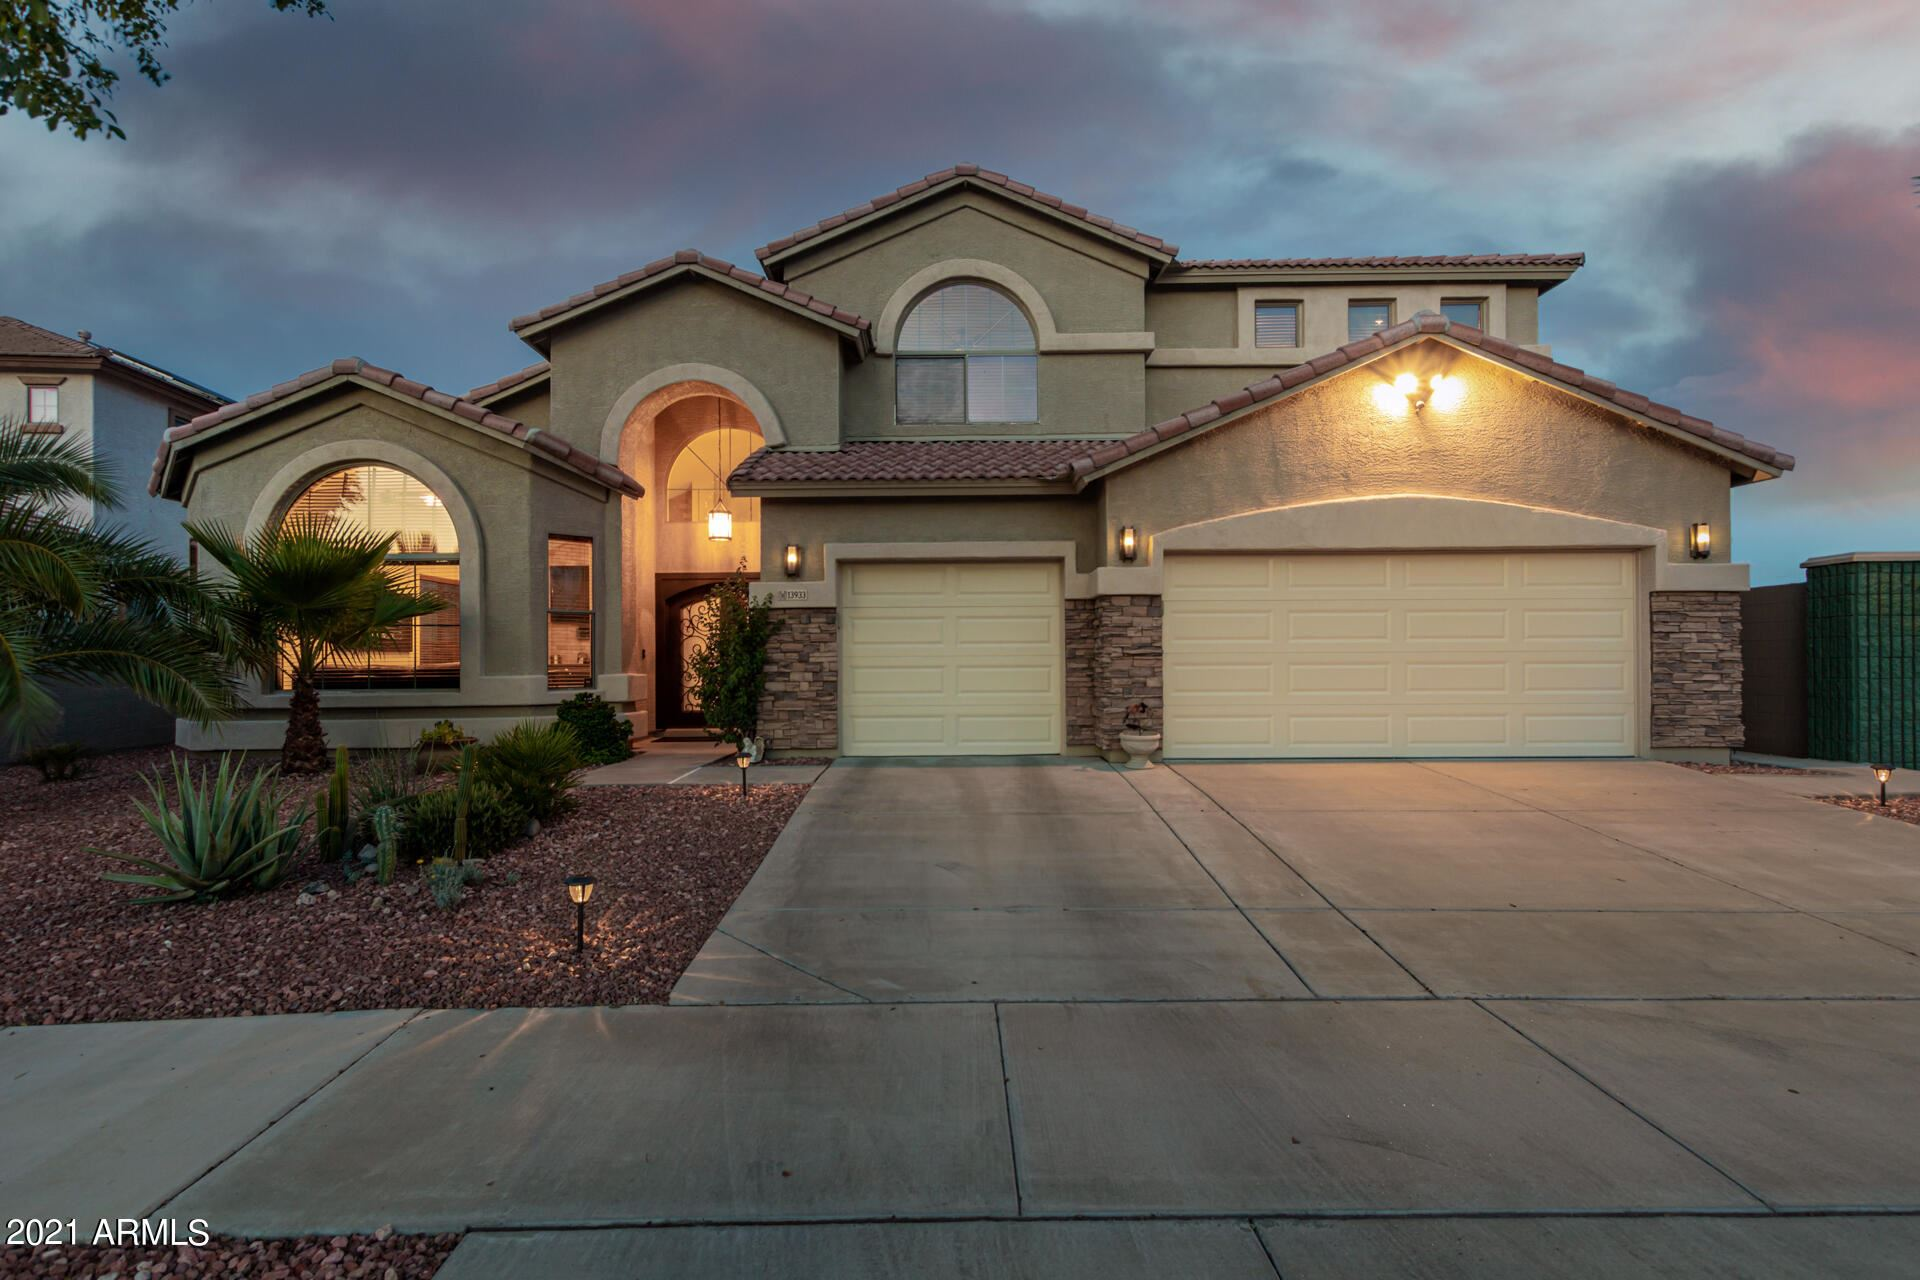 Photo of 13933 N 135TH Drive, Surprise, AZ 85379 (MLS # 6271112)